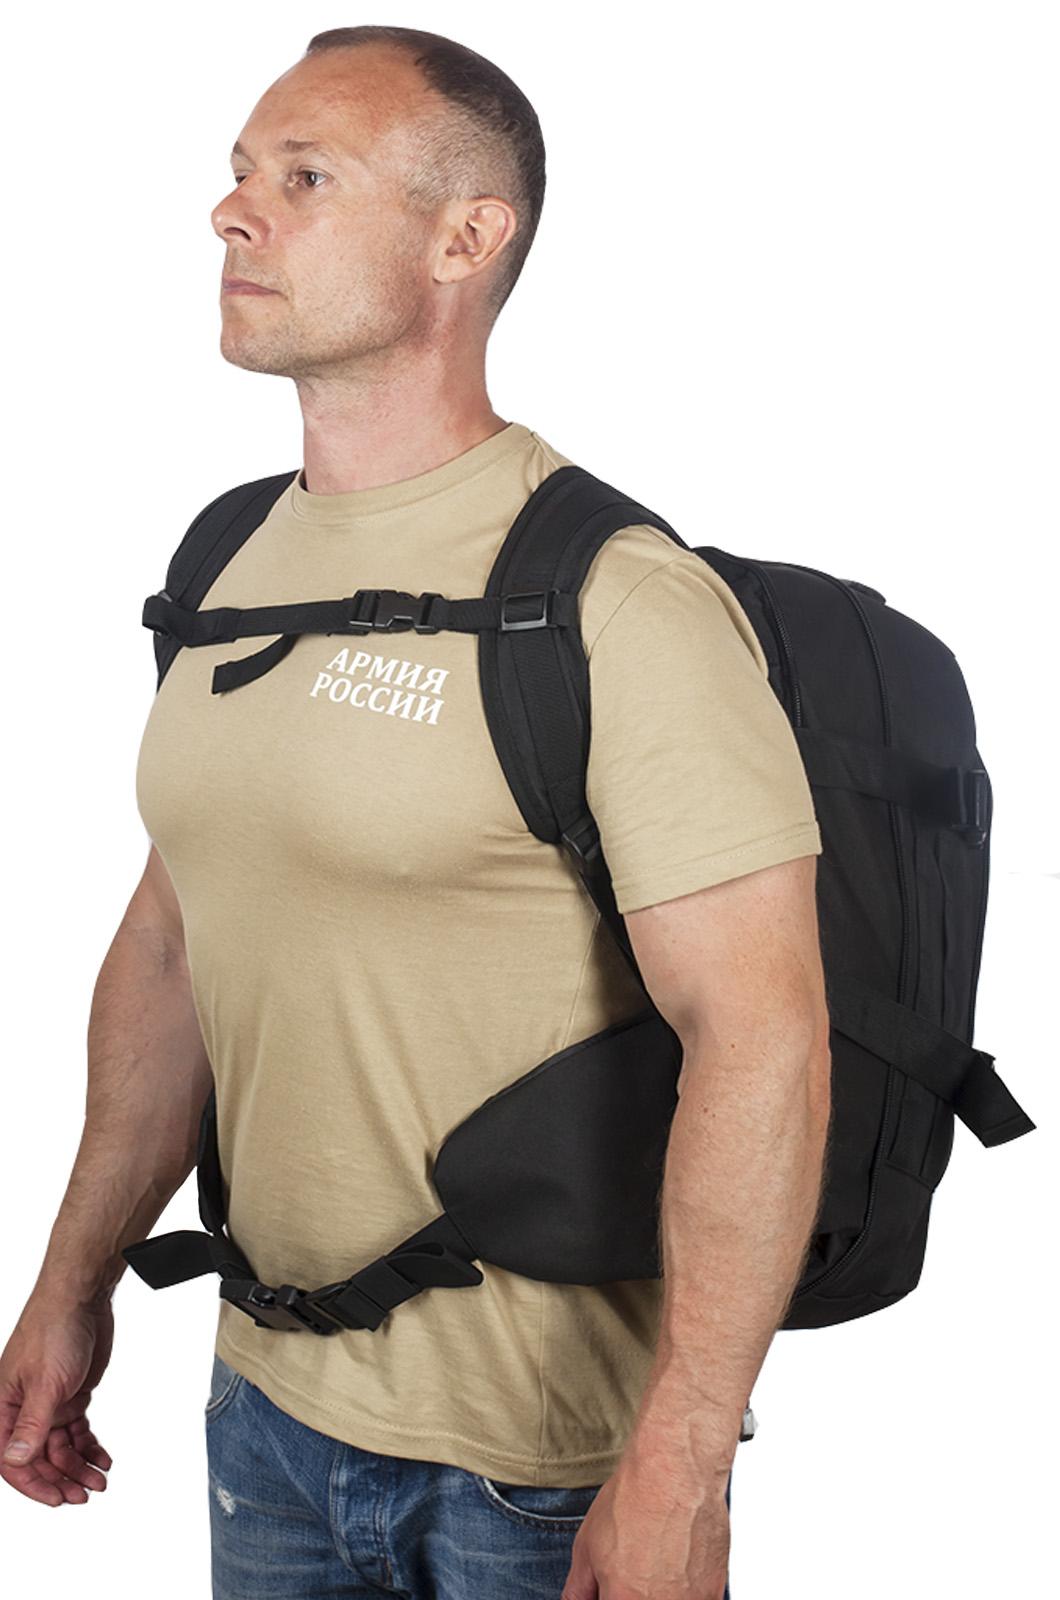 Черный армейский рюкзак 3-Day Expandable Backpack 08002A Black по выгодной цене